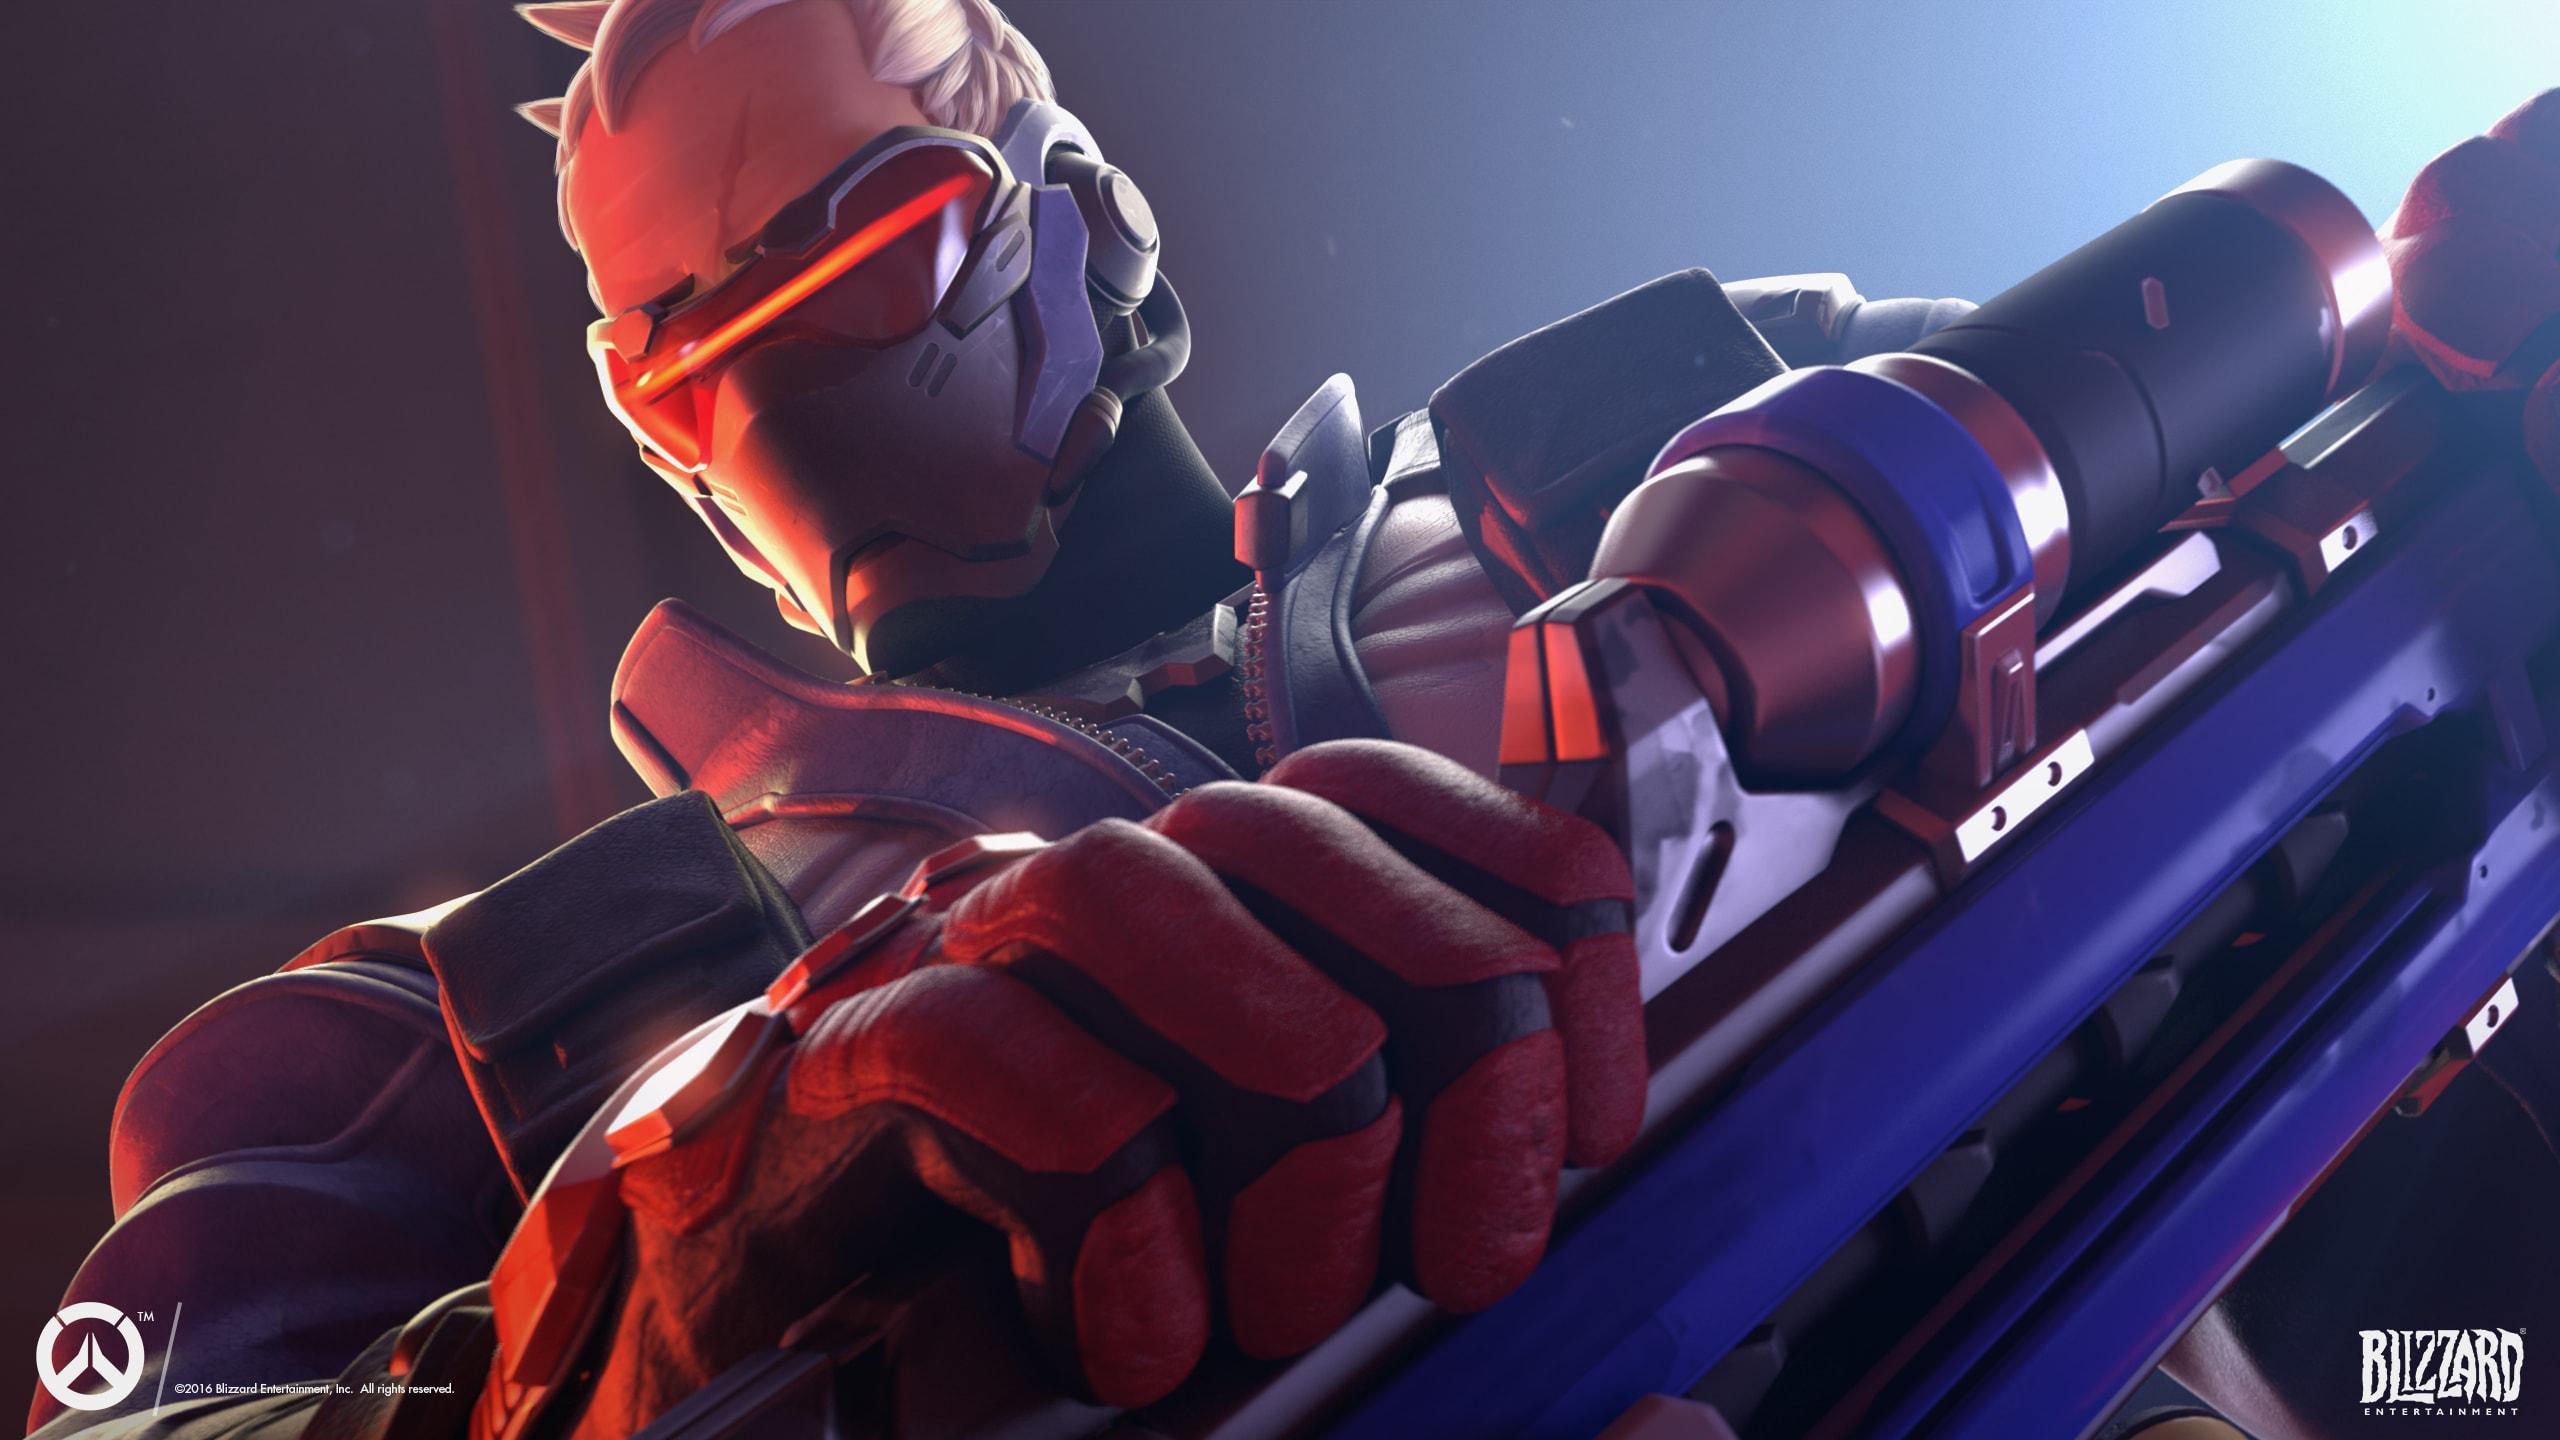 Overwatch : Soldier: 76 Wallpapers